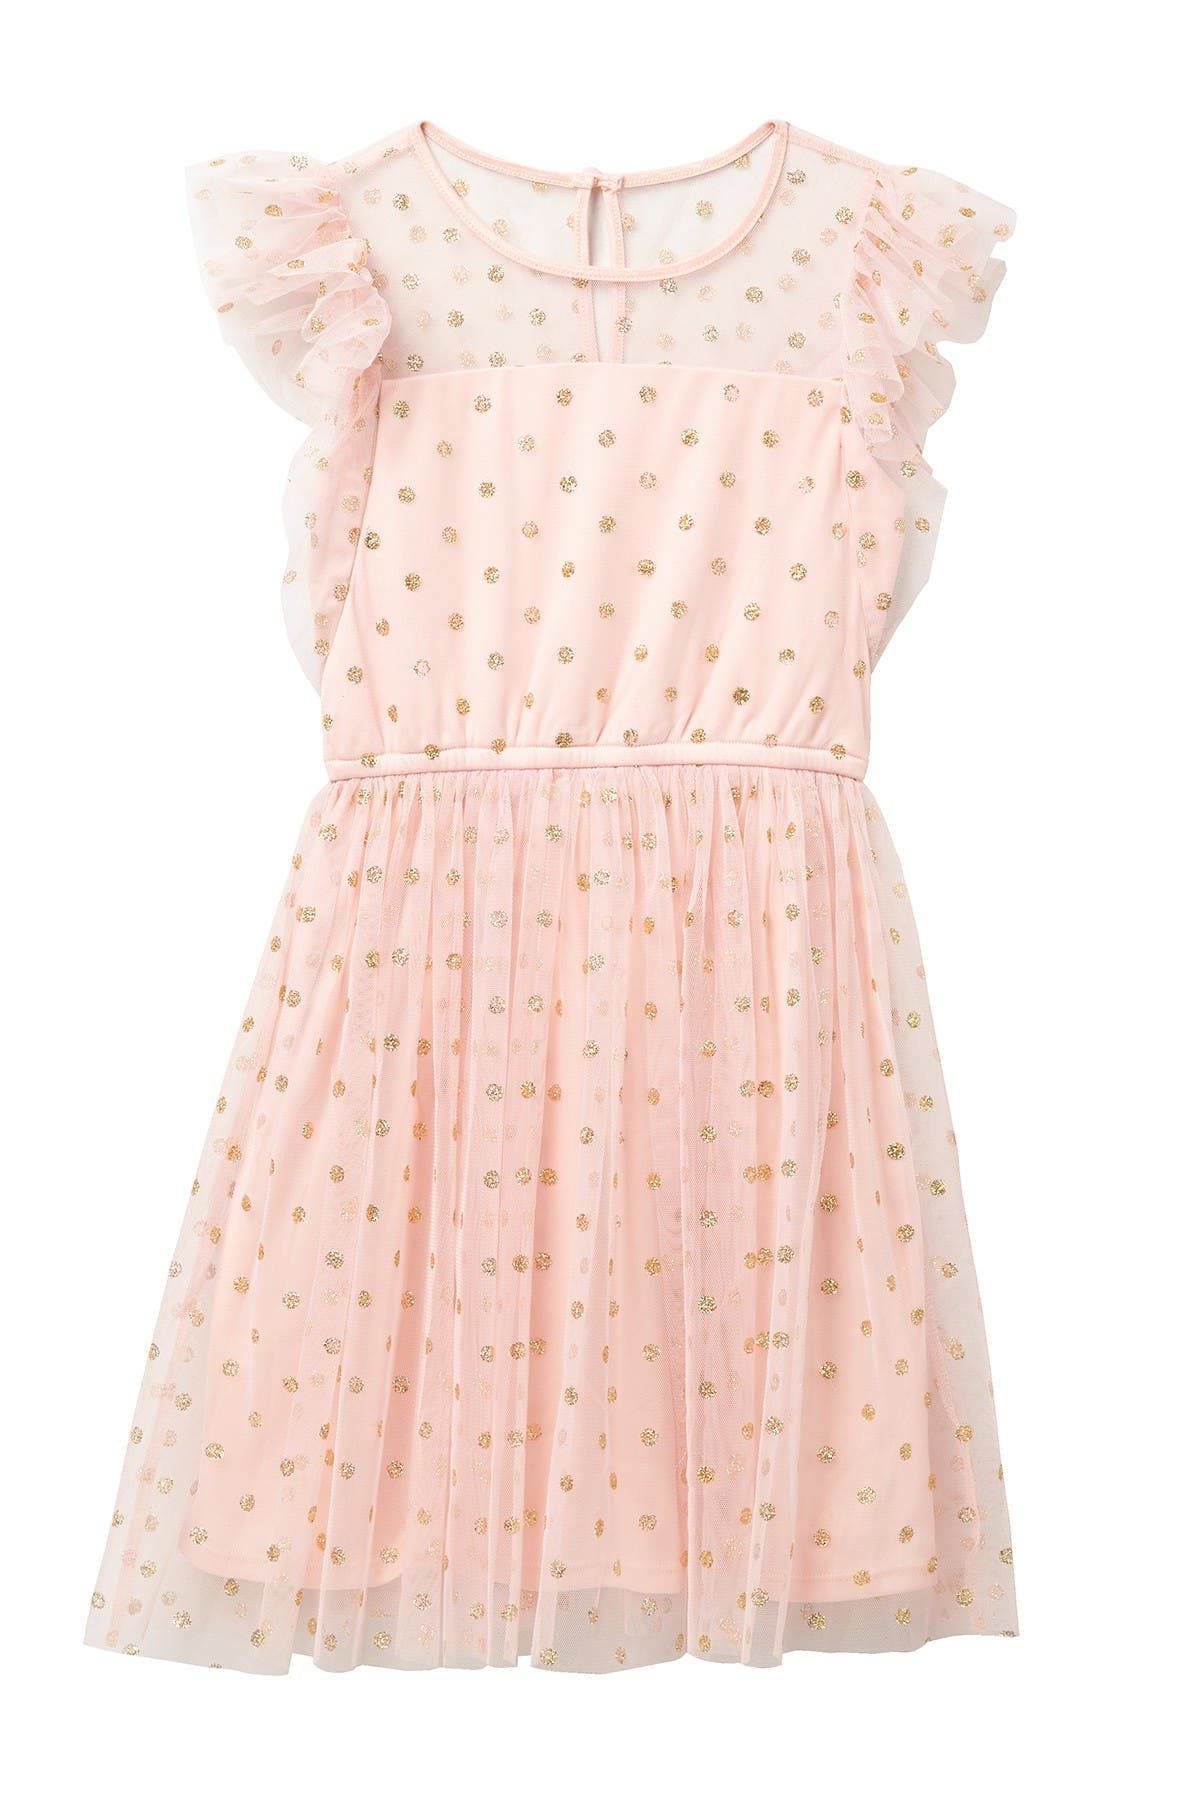 Image of Love, Nickie Lew Glitter Dot Flutter Sleeve Dress